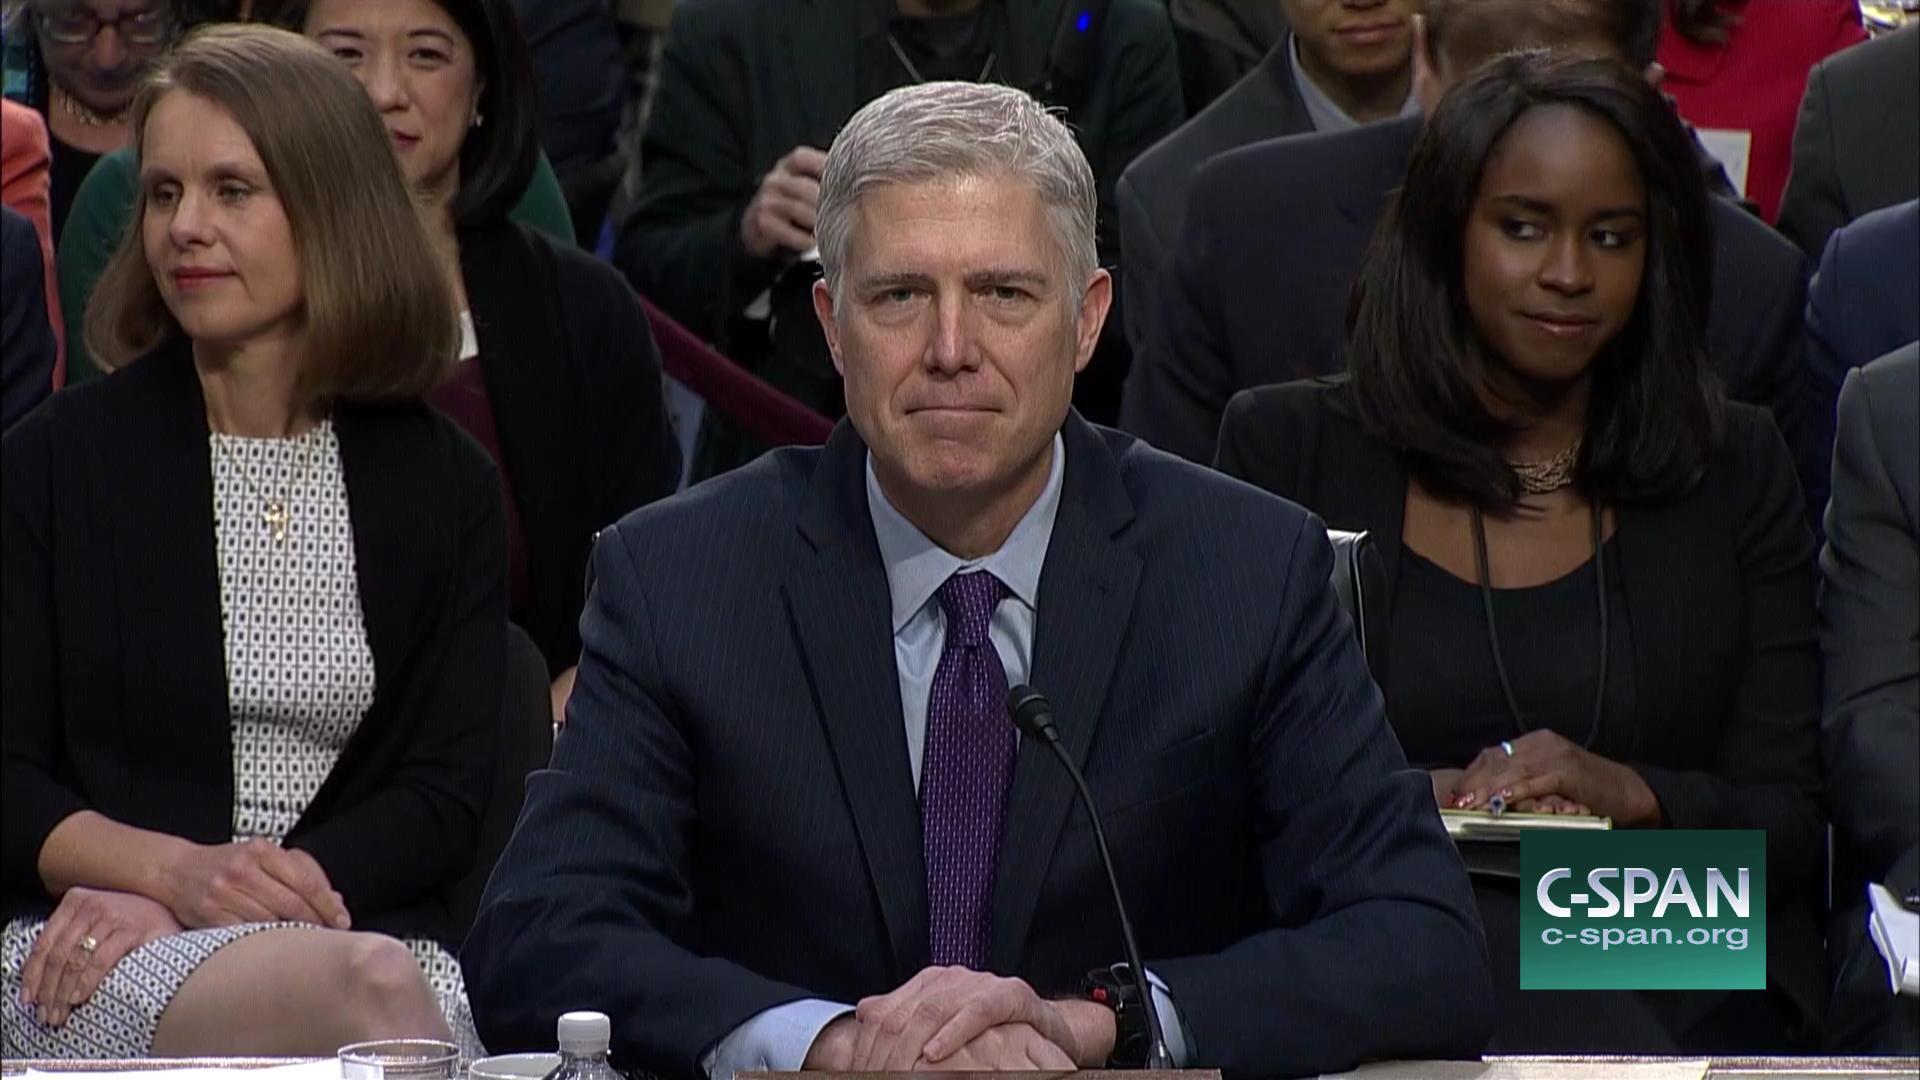 Na national treasure 2 diane kruger whitehouse dress mid bmp - Supreme Court Nominee Stresses Independence Calls Criticism Judges Disheartening